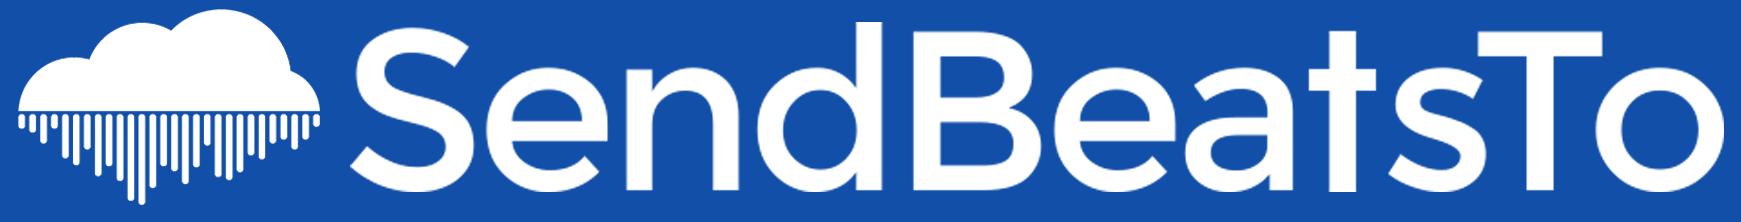 SendBeatsTo Logo Landscape, Typography, Blue Background